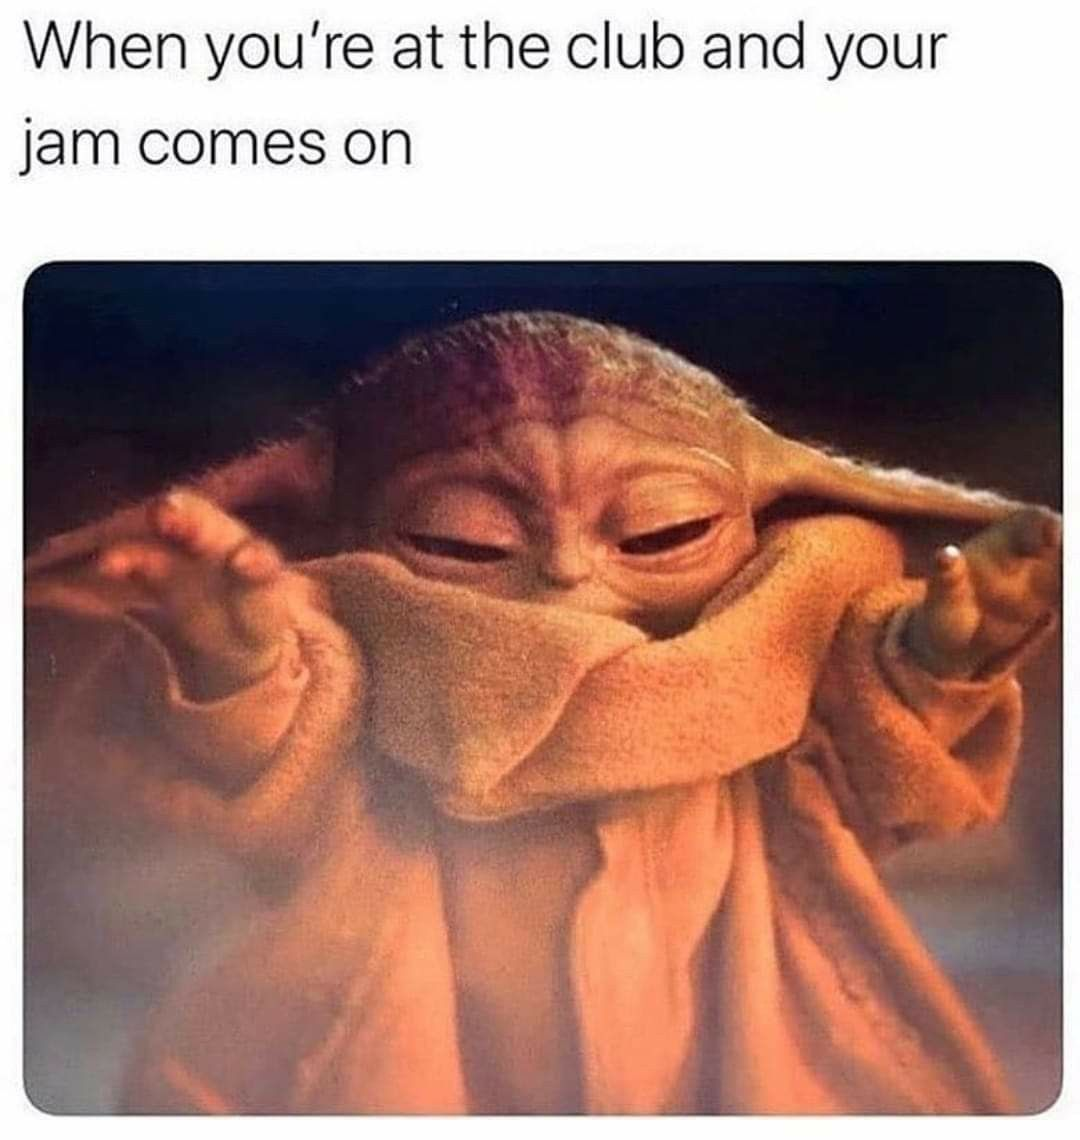 Pin By Devan Spychalski On True Story Really Funny Memes Yoda Meme Funny Relatable Memes